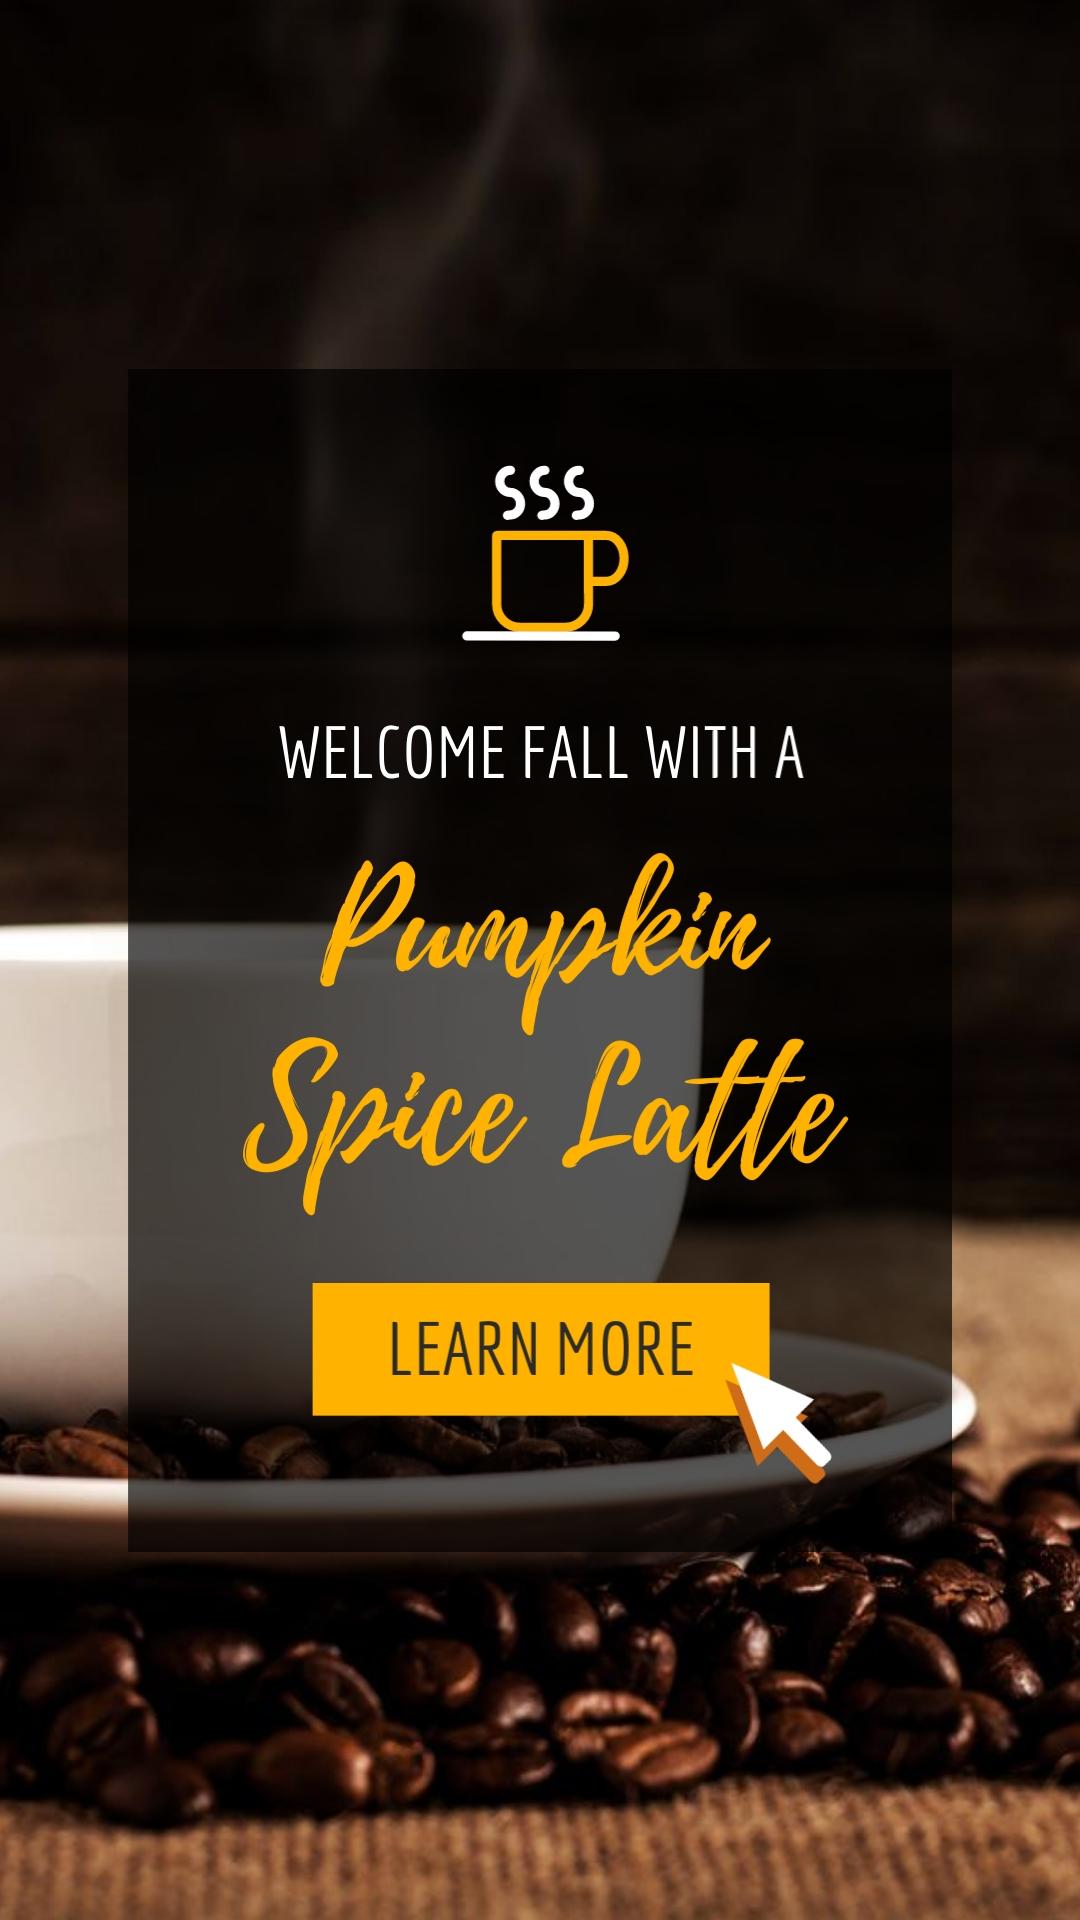 Pumpkin Spice Latte Vertical Template